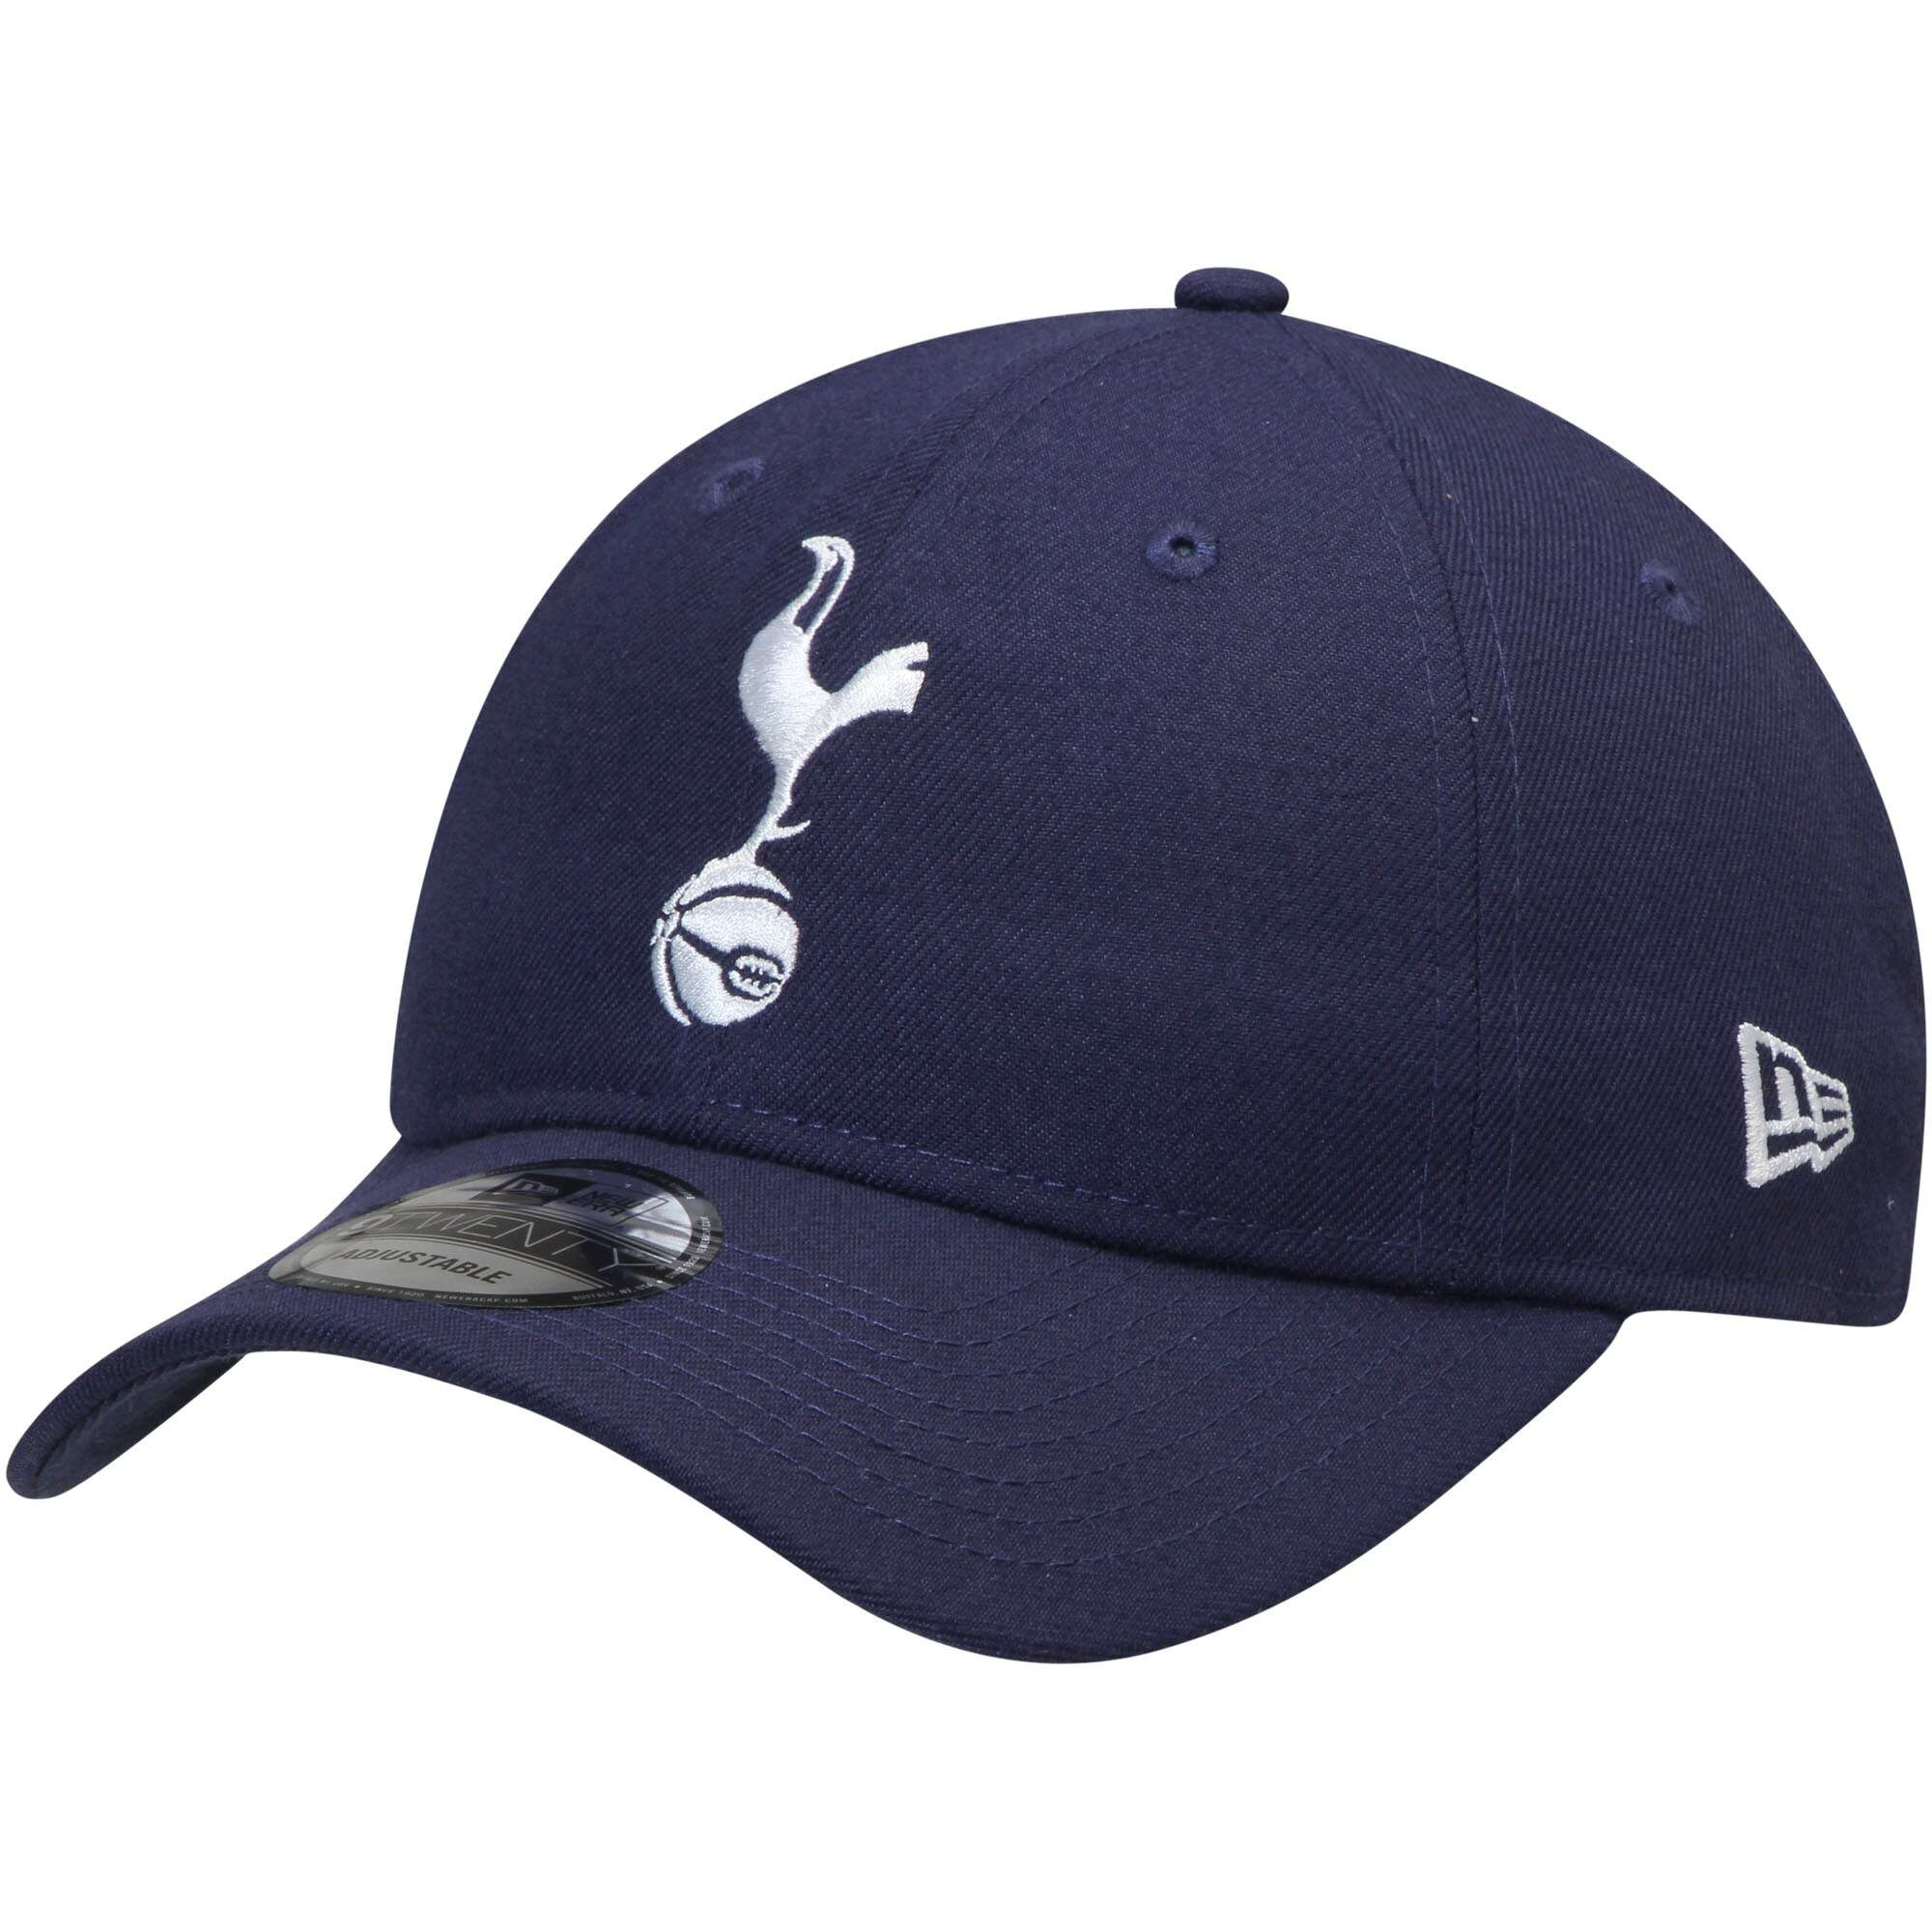 Hat: Soccer - Tottenham Hotspur Navy 9TWENTY Photo